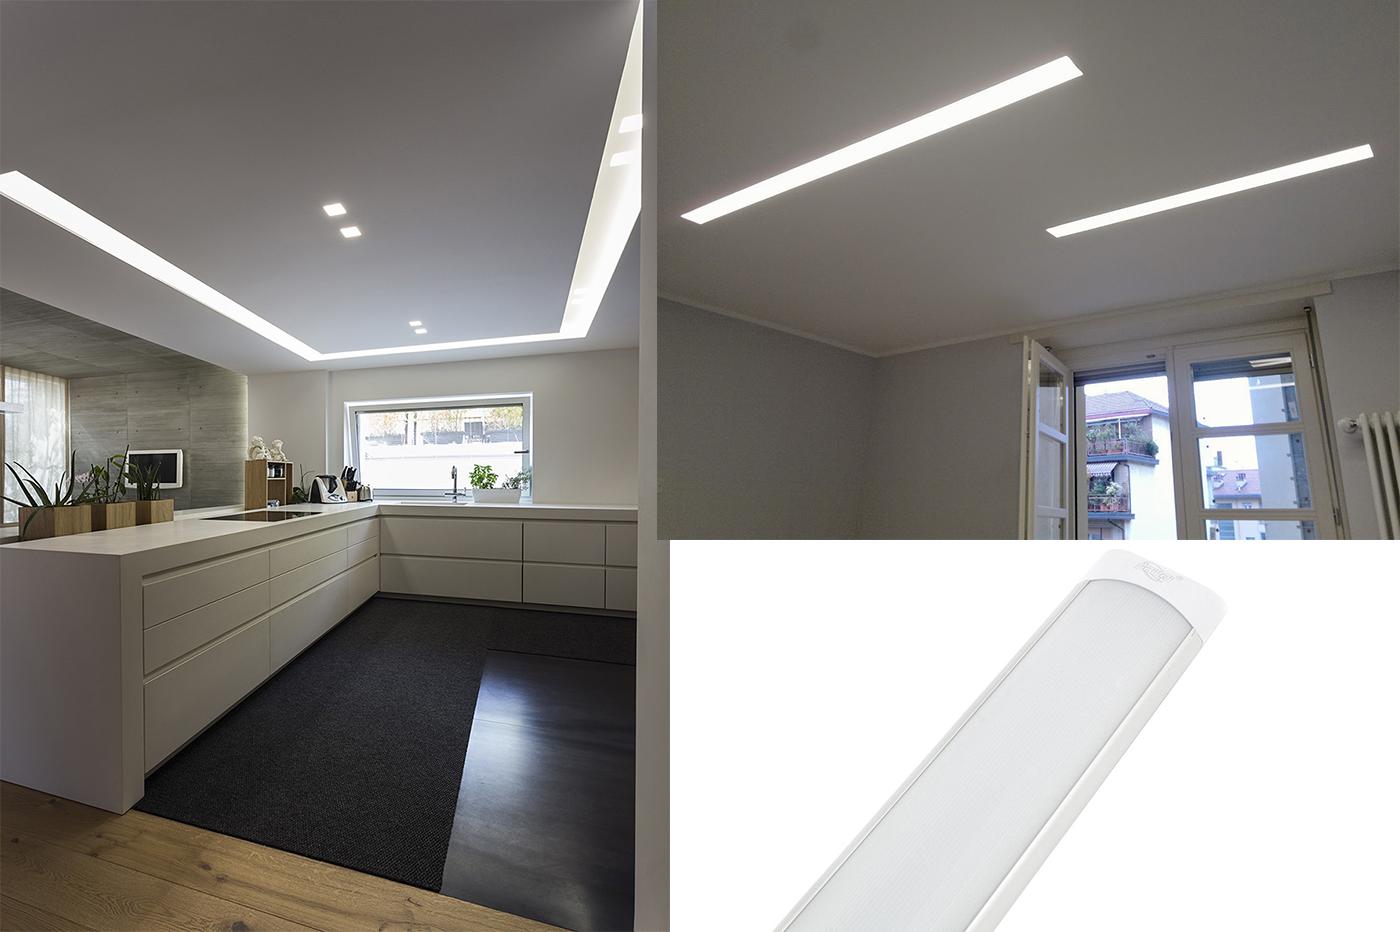 Plafoniere Slim Led Calda : Plafoniera led w watt luce calda cm slim smd soffitto v